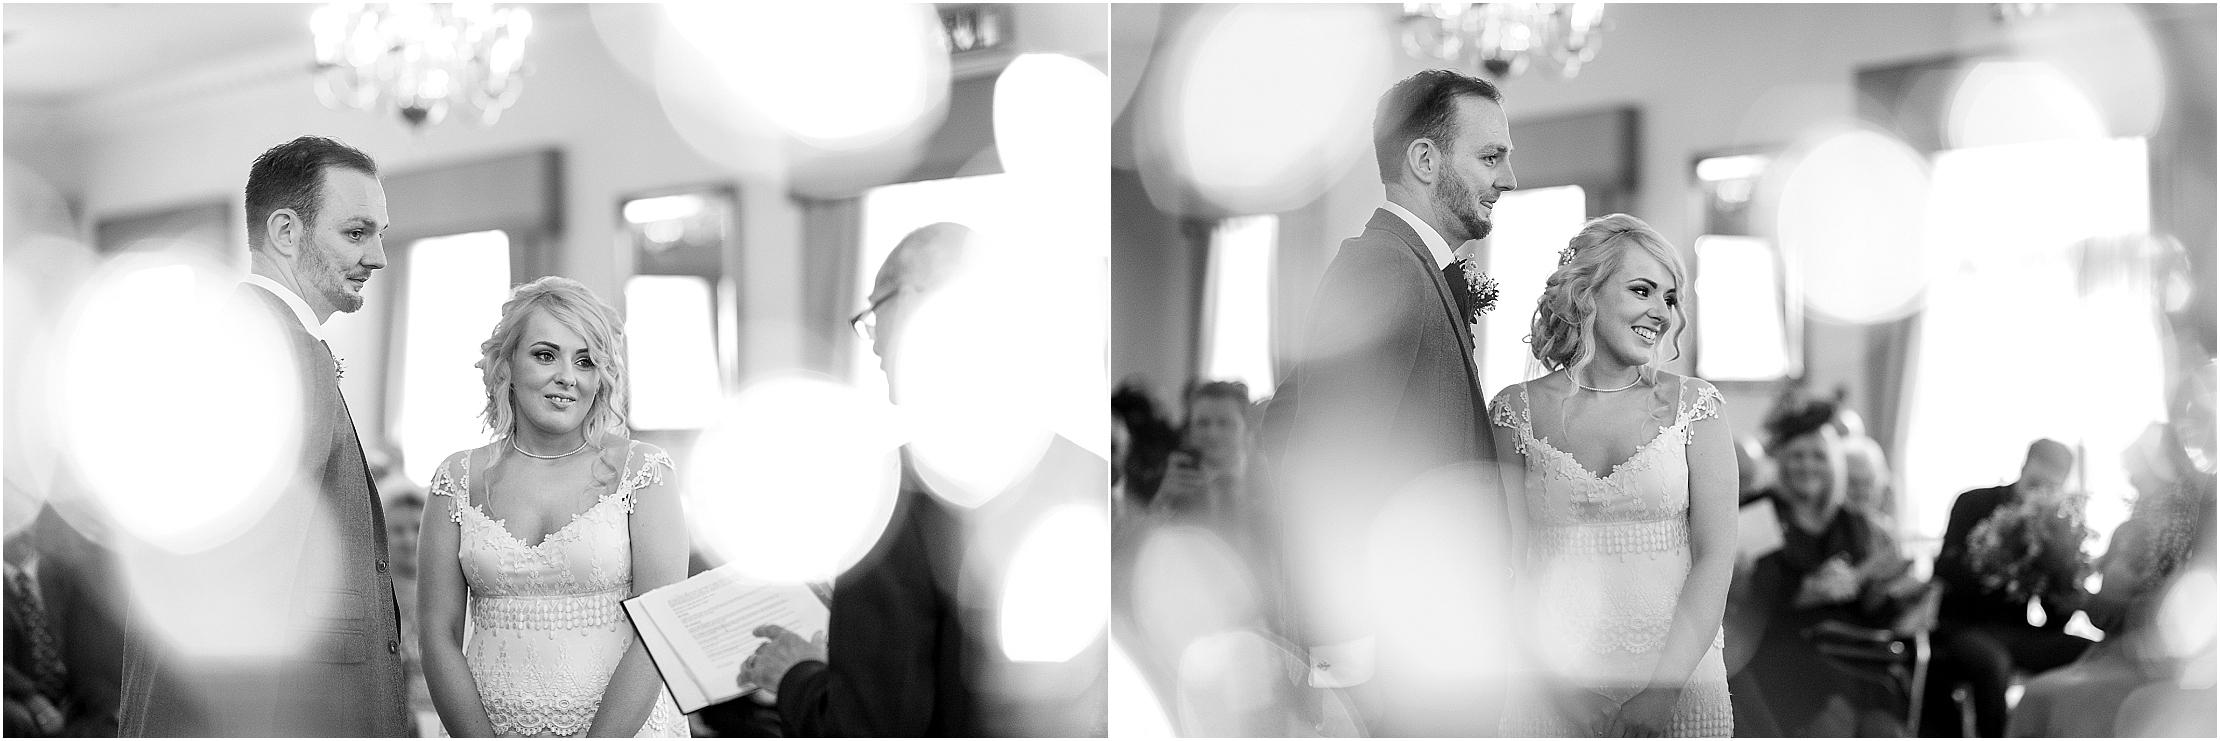 farington-lodge-wedding-39.jpg